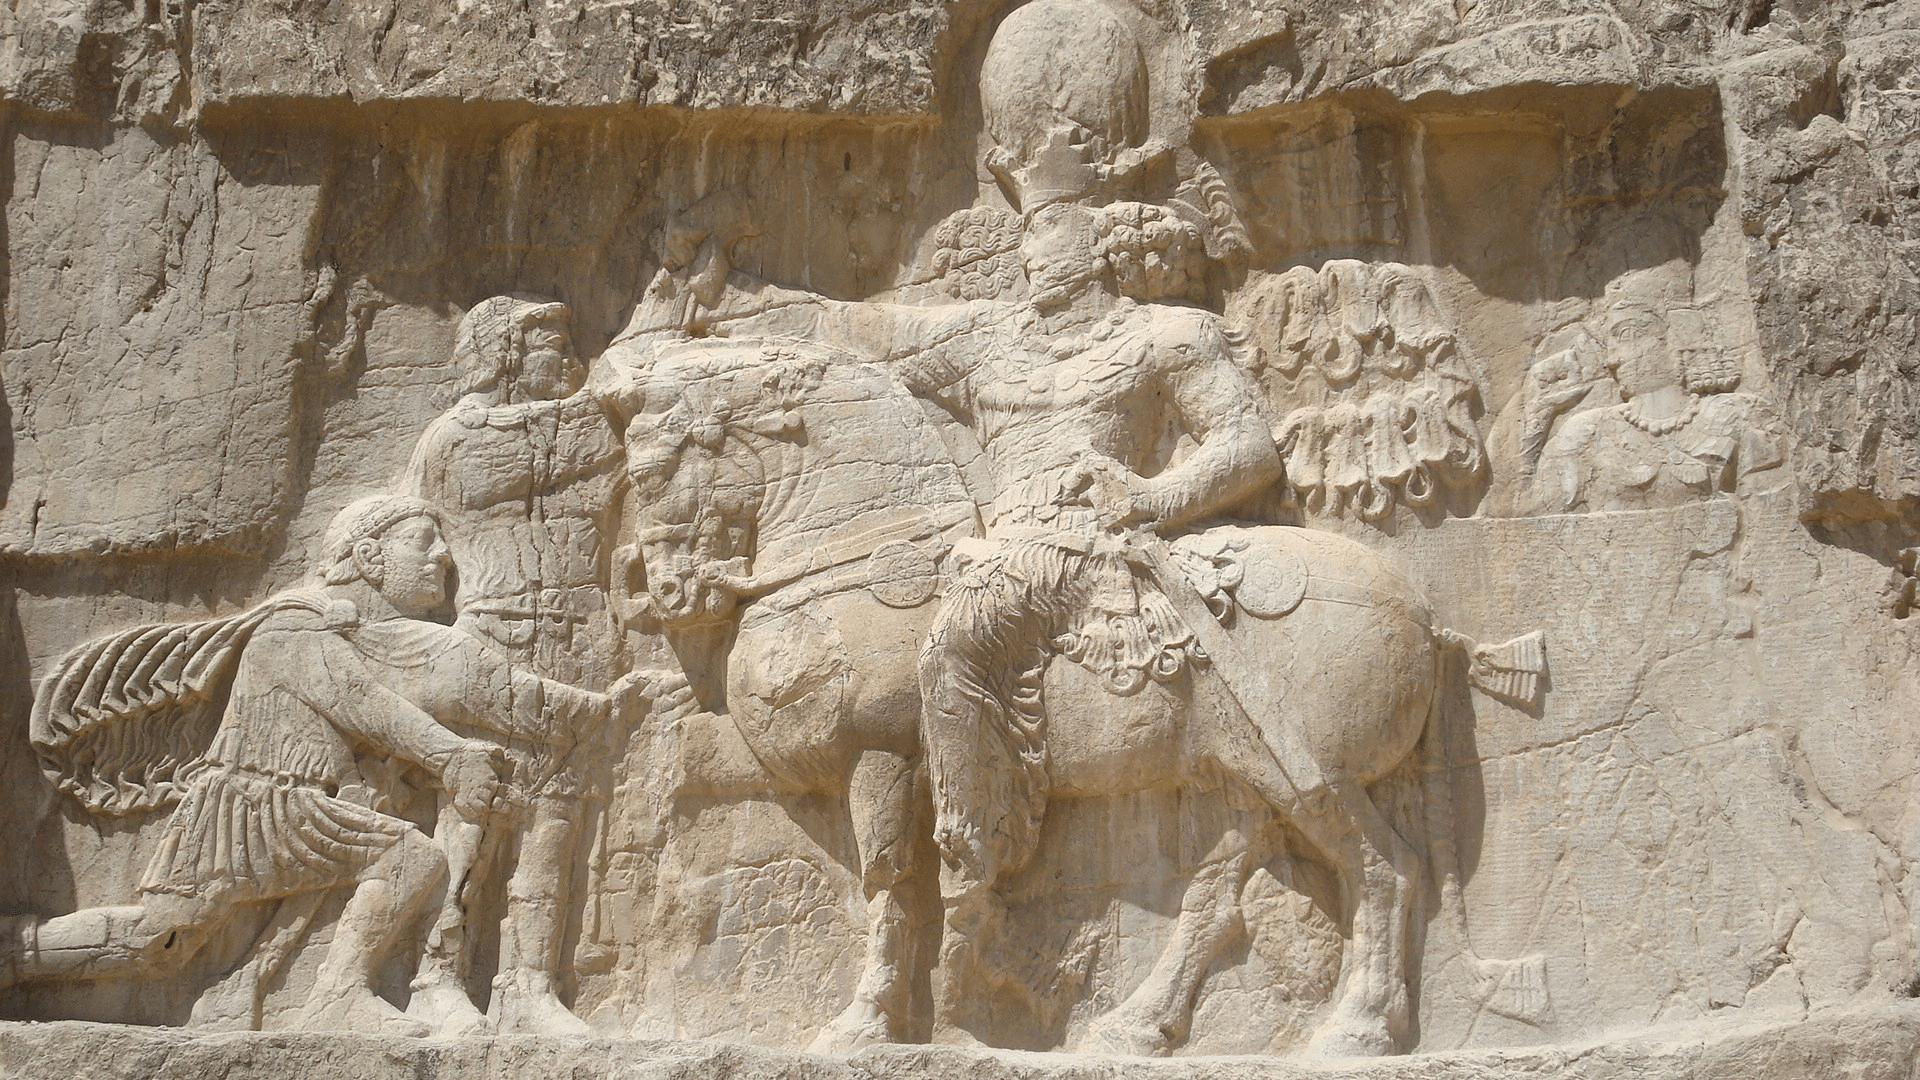 Filipo el Árabe humillándose delante de Sapor I. Relieve de Naqsh- e Rostam